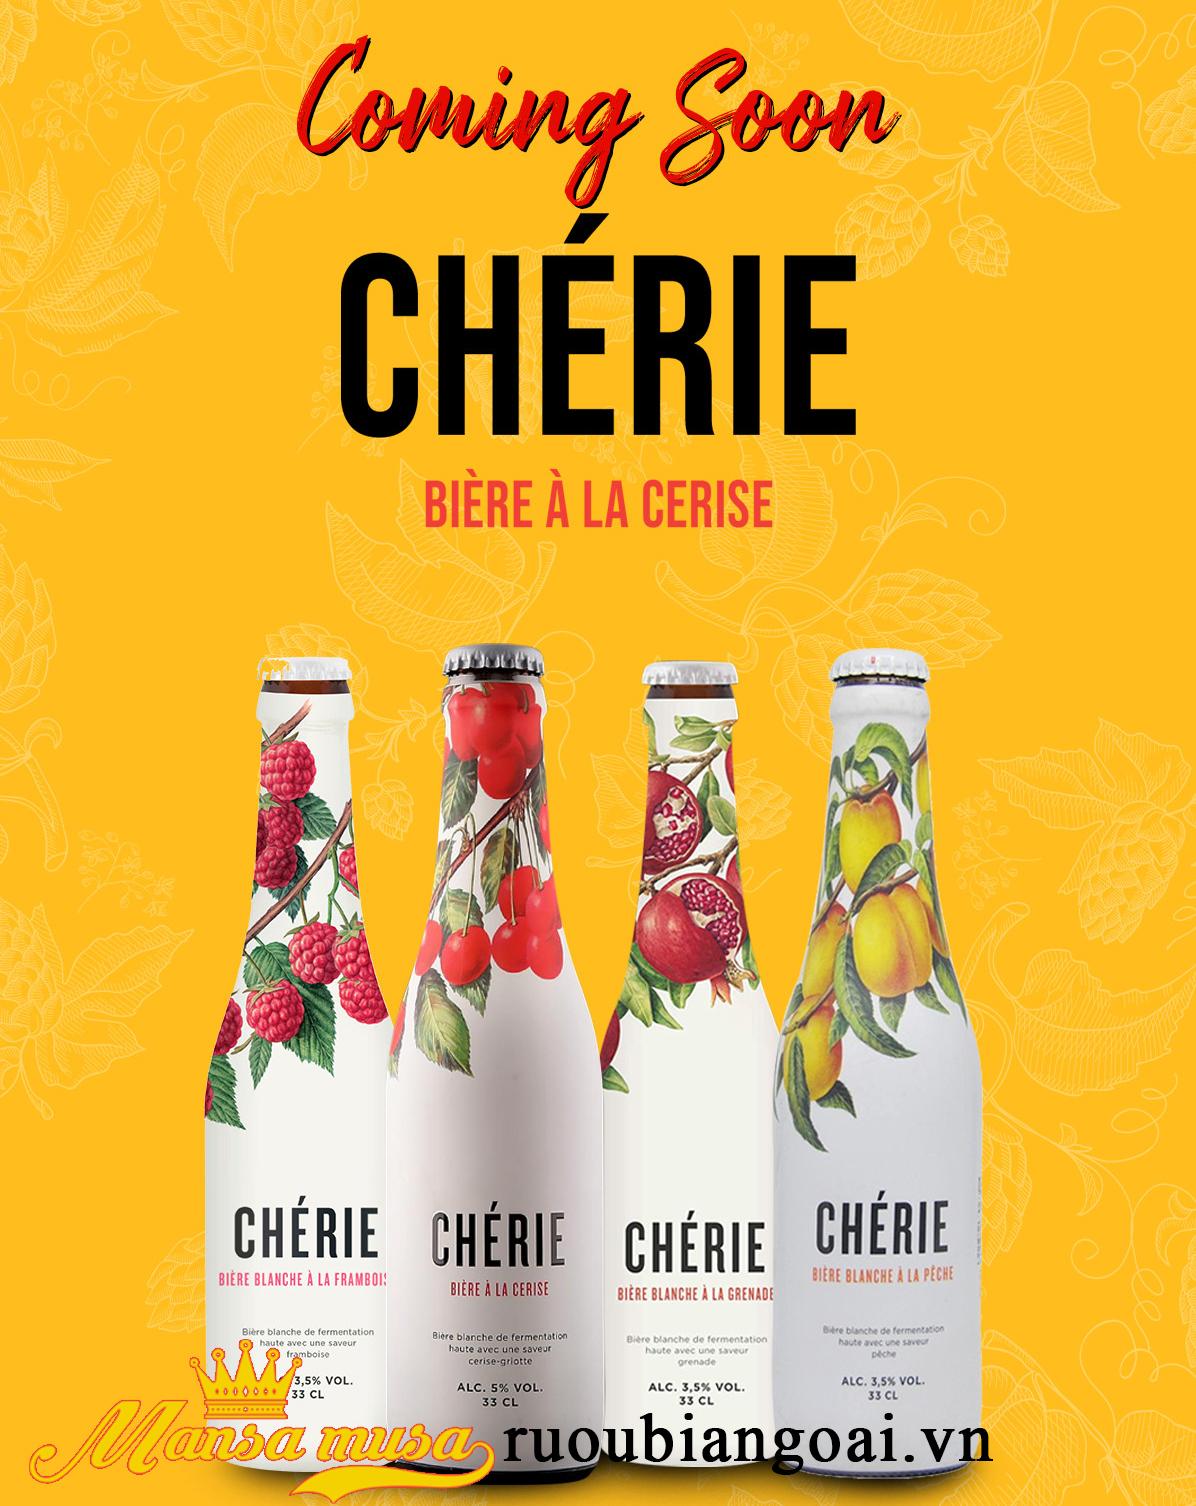 Bia Bỉ Cherie Cerise